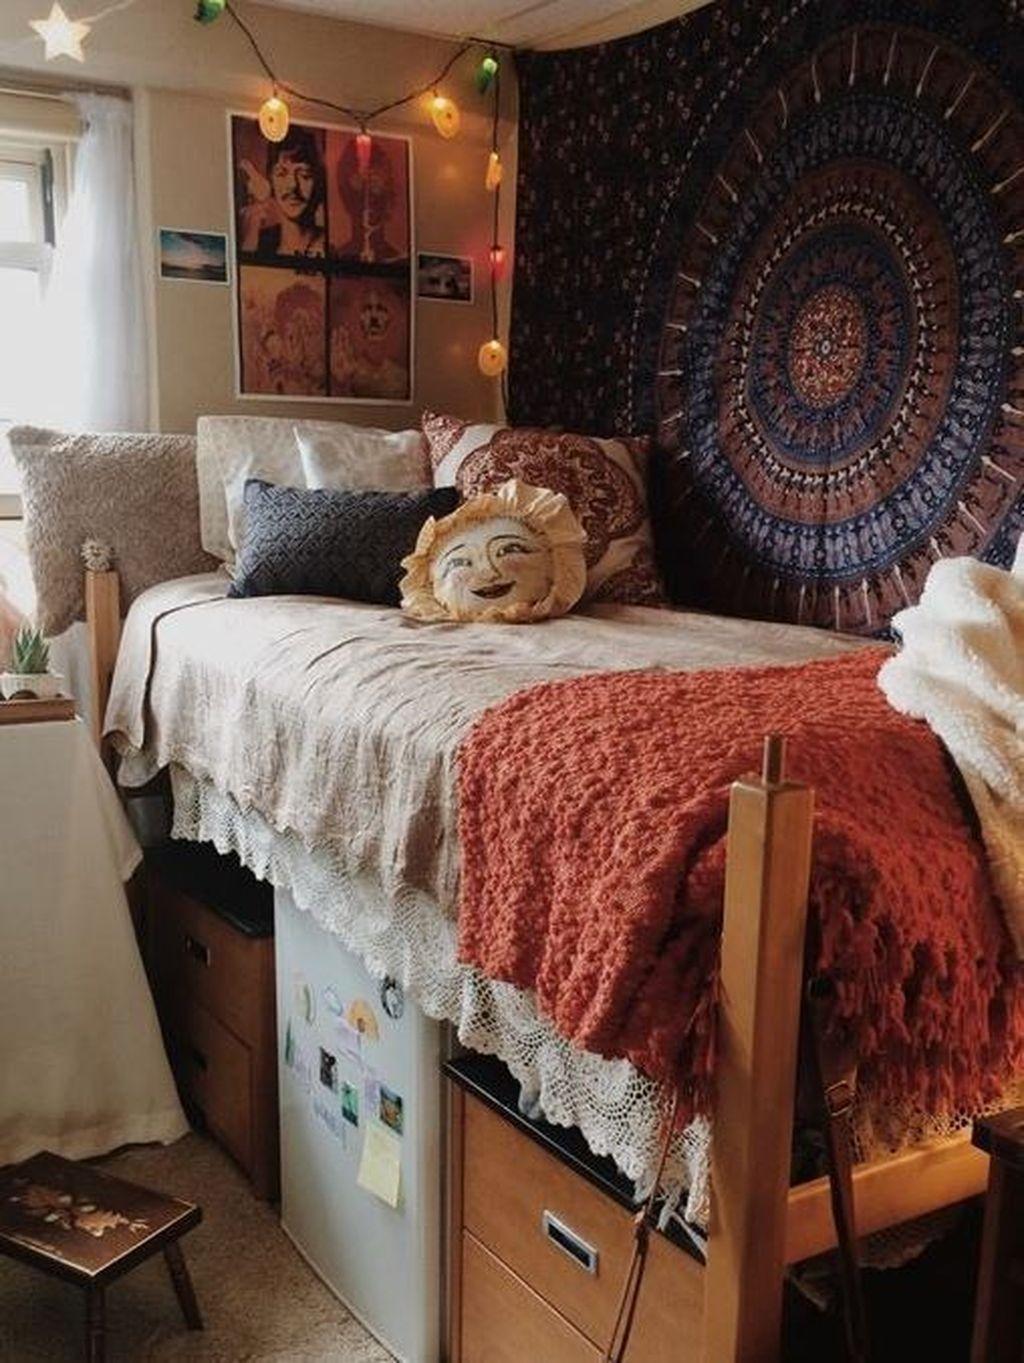 20+ Easy Ways For DIY Dorm Room Decor Ideas images